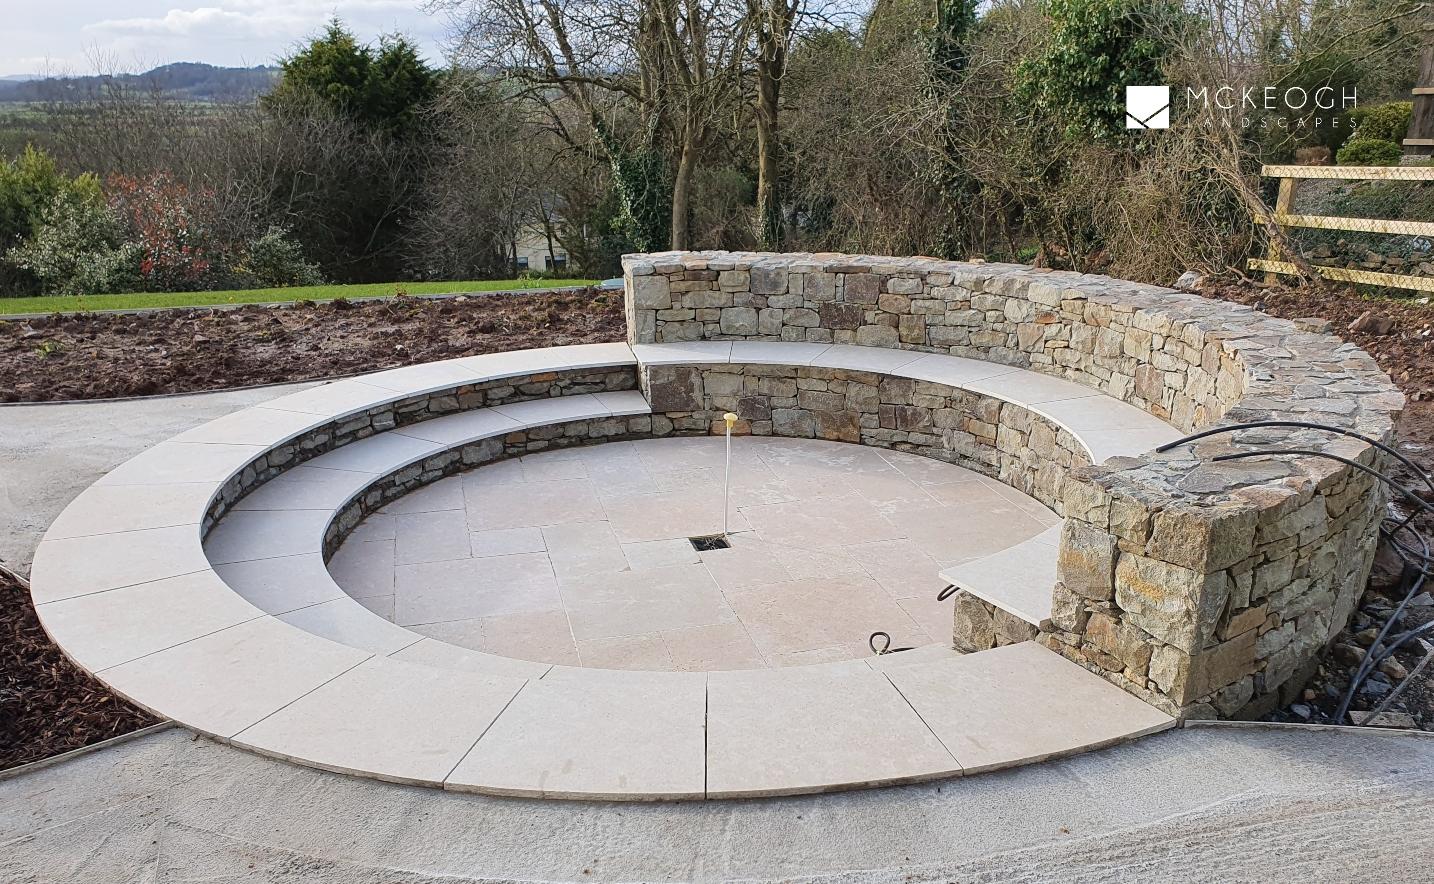 Circular sunken firepit and circular steps